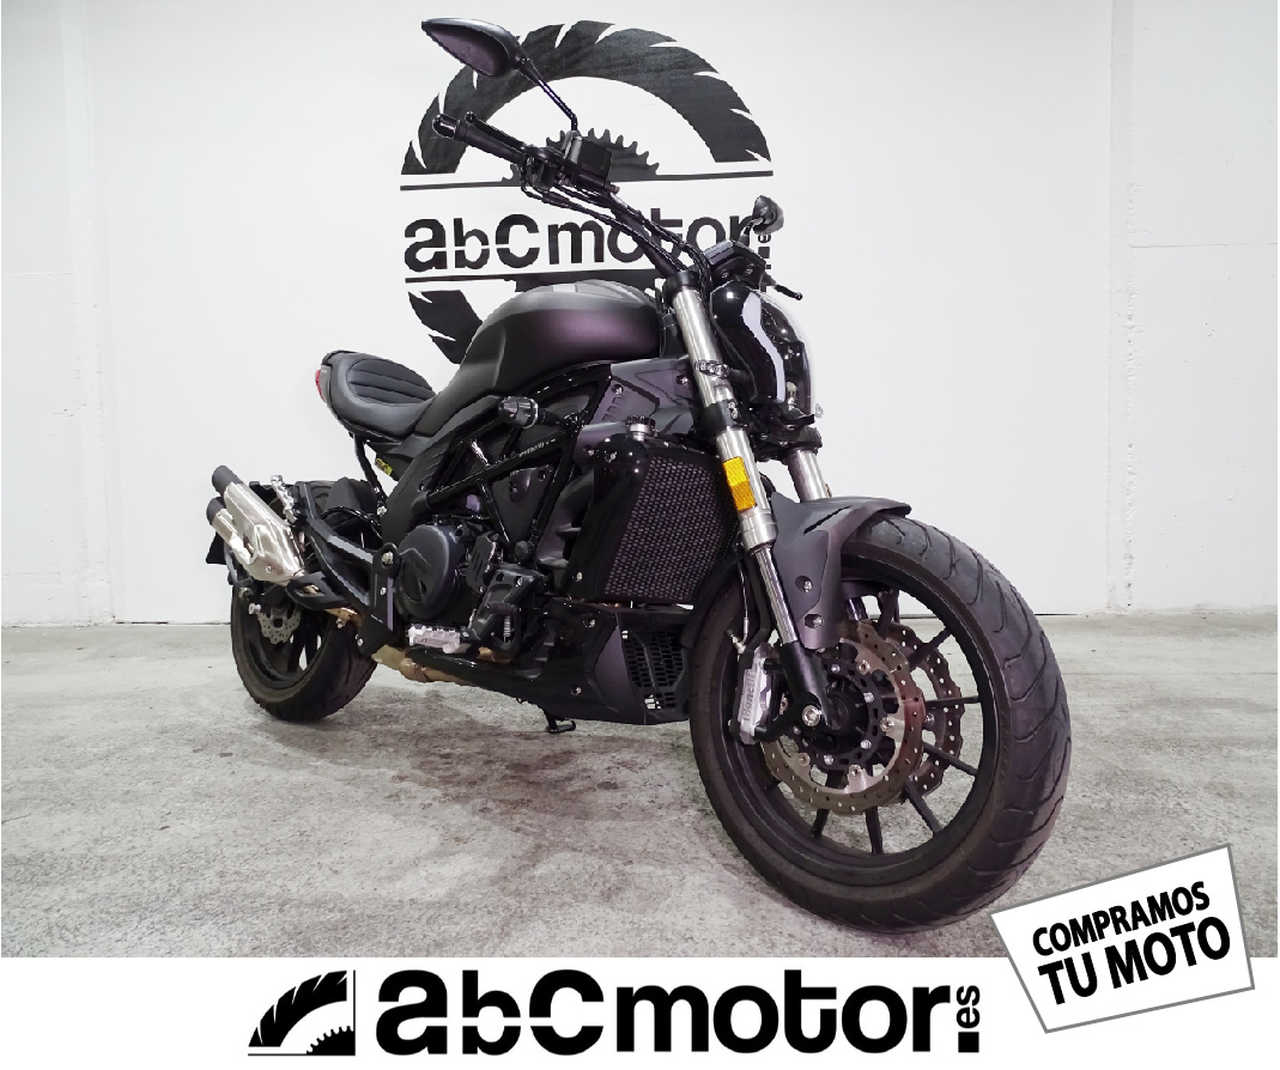 Benelli Otros  502 C A2 ABS  - Foto 1